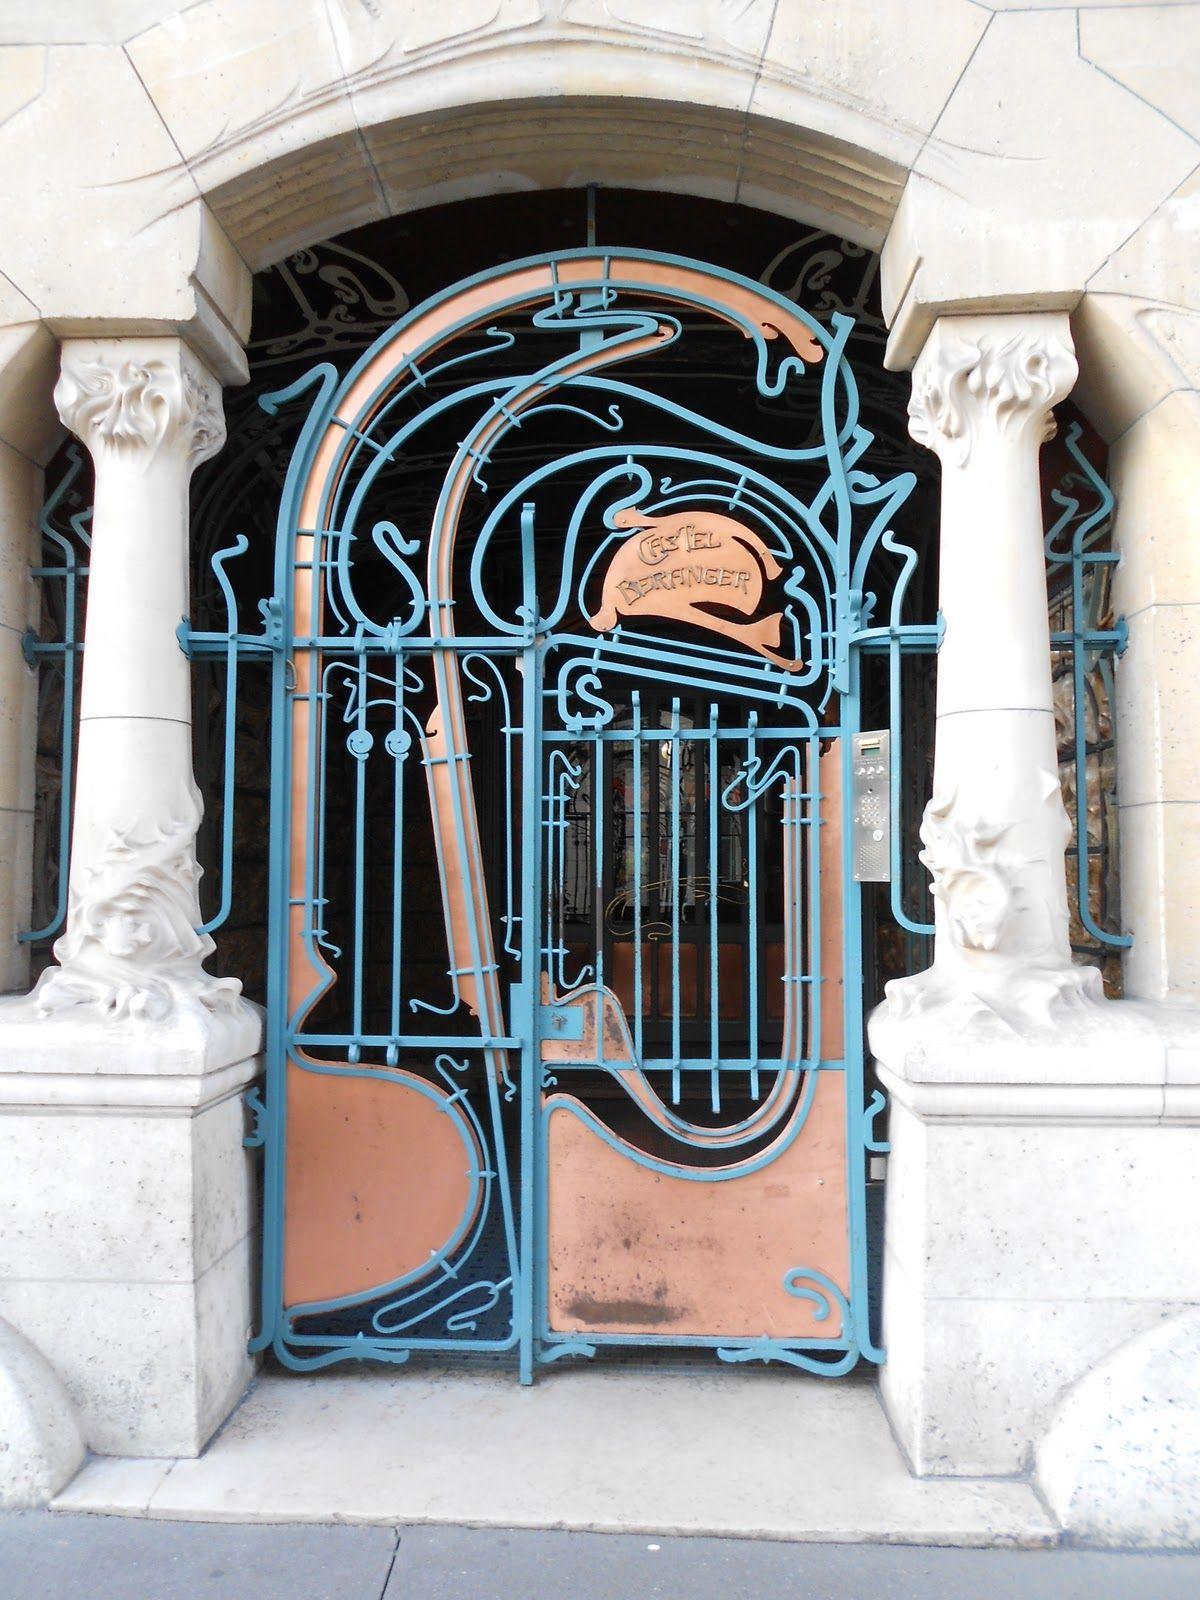 Le Castel Beranger d'Hector Guimard parisblogged